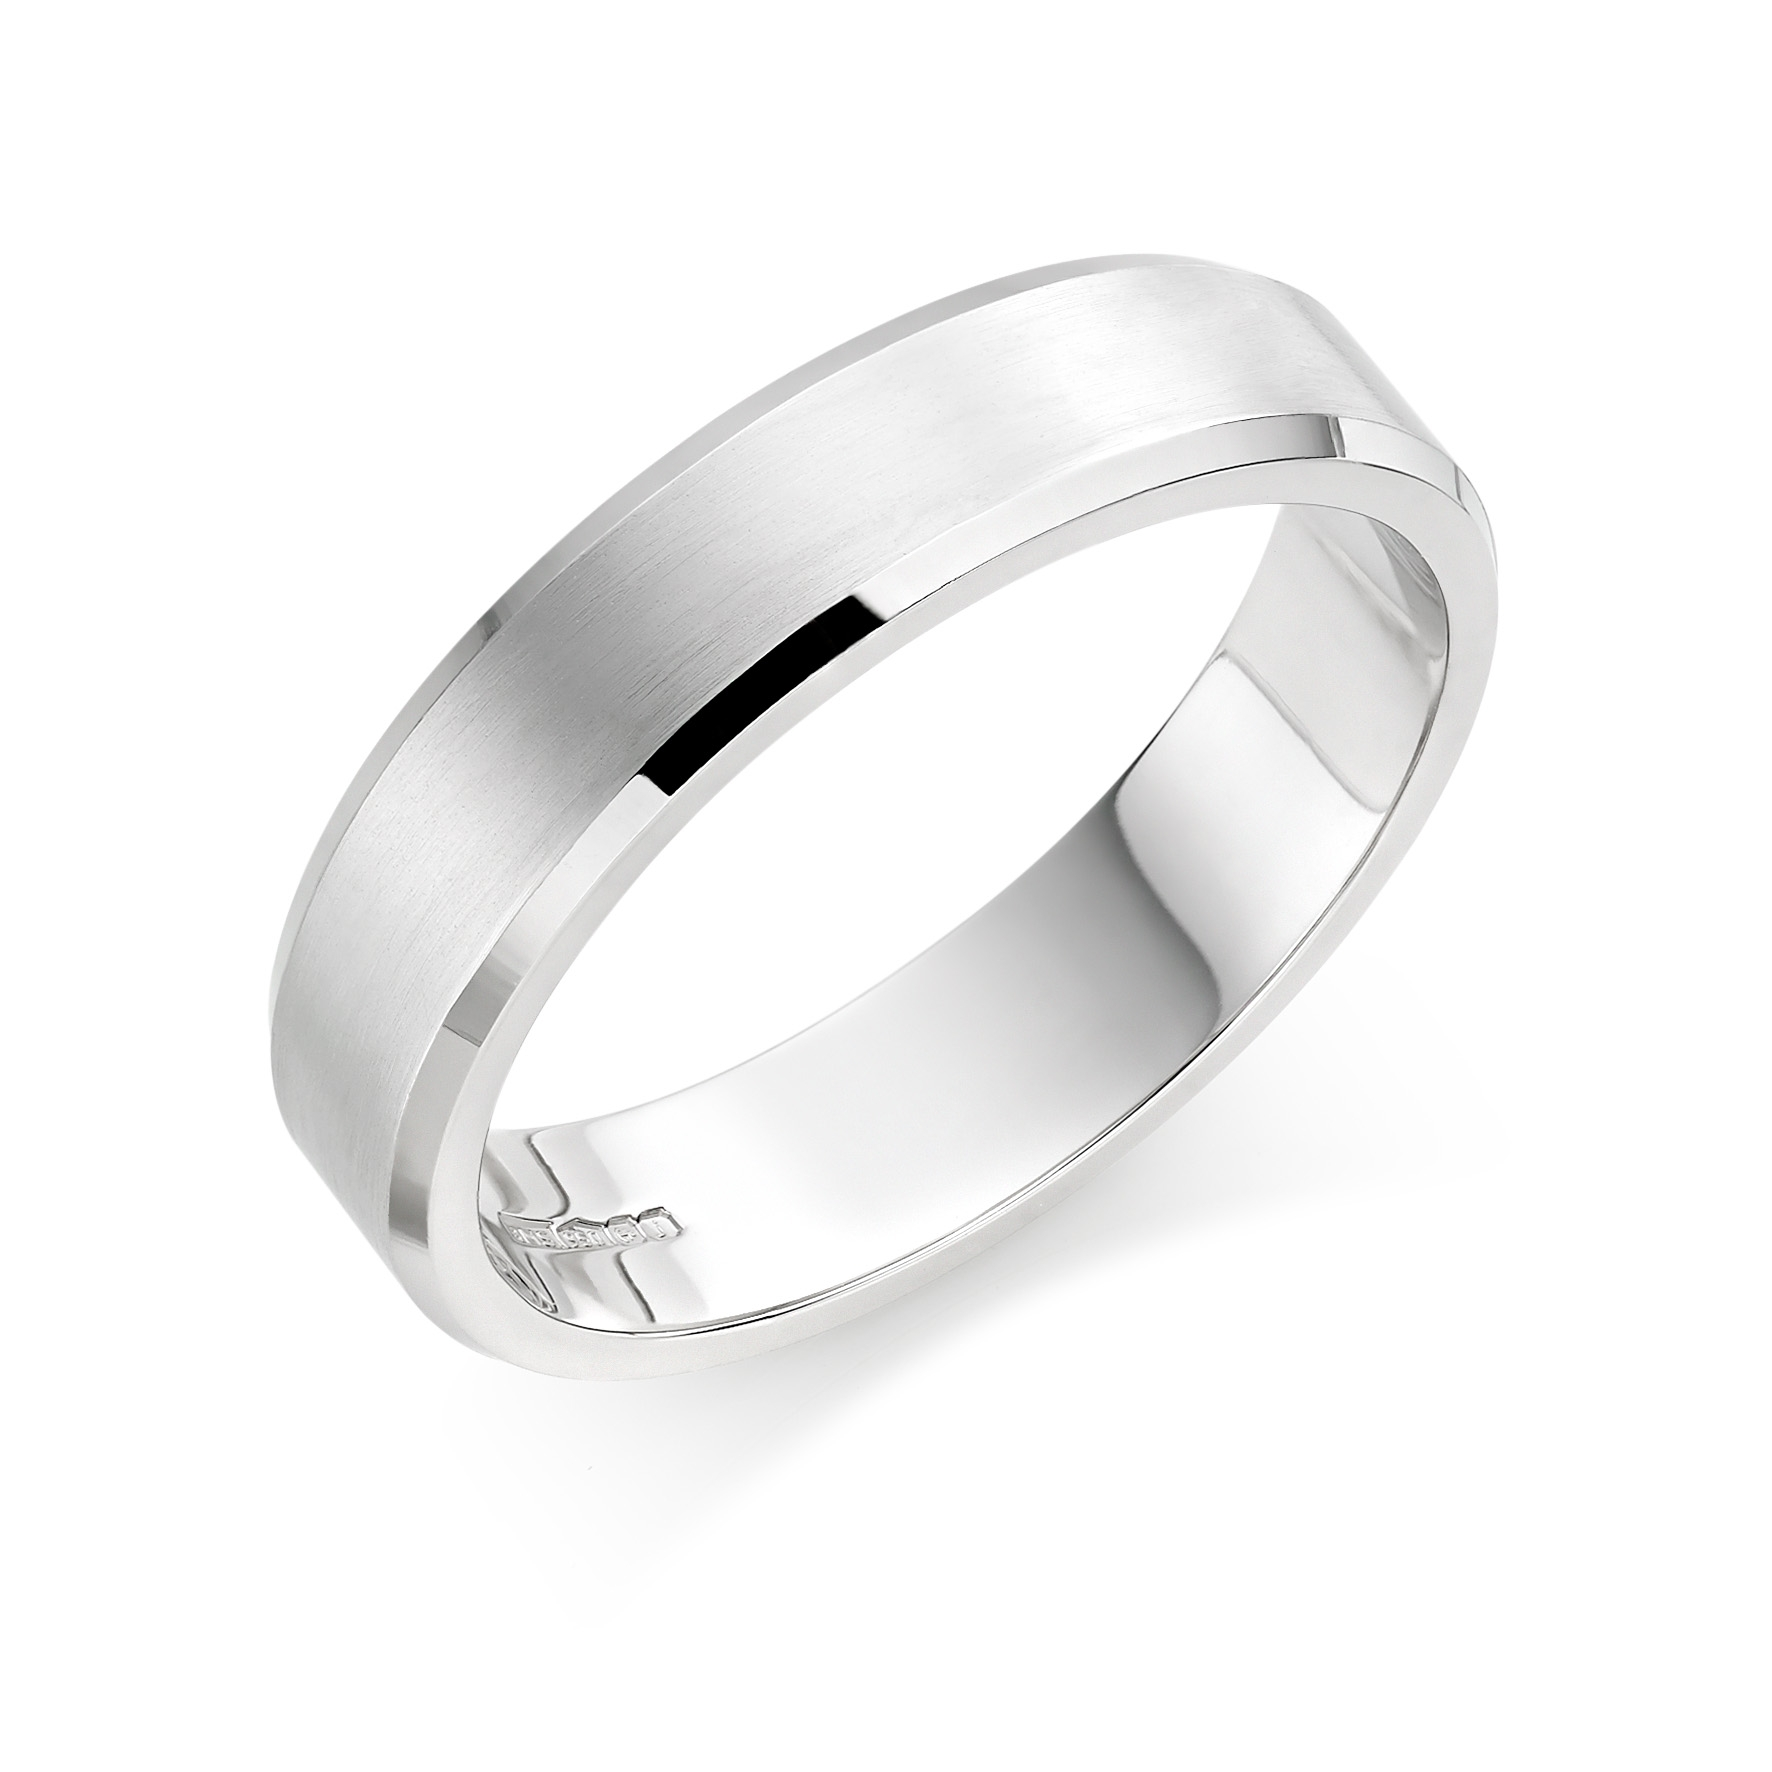 Contemporary Wedding Rings In Hatton Garden - Rennie & Co Jewellers